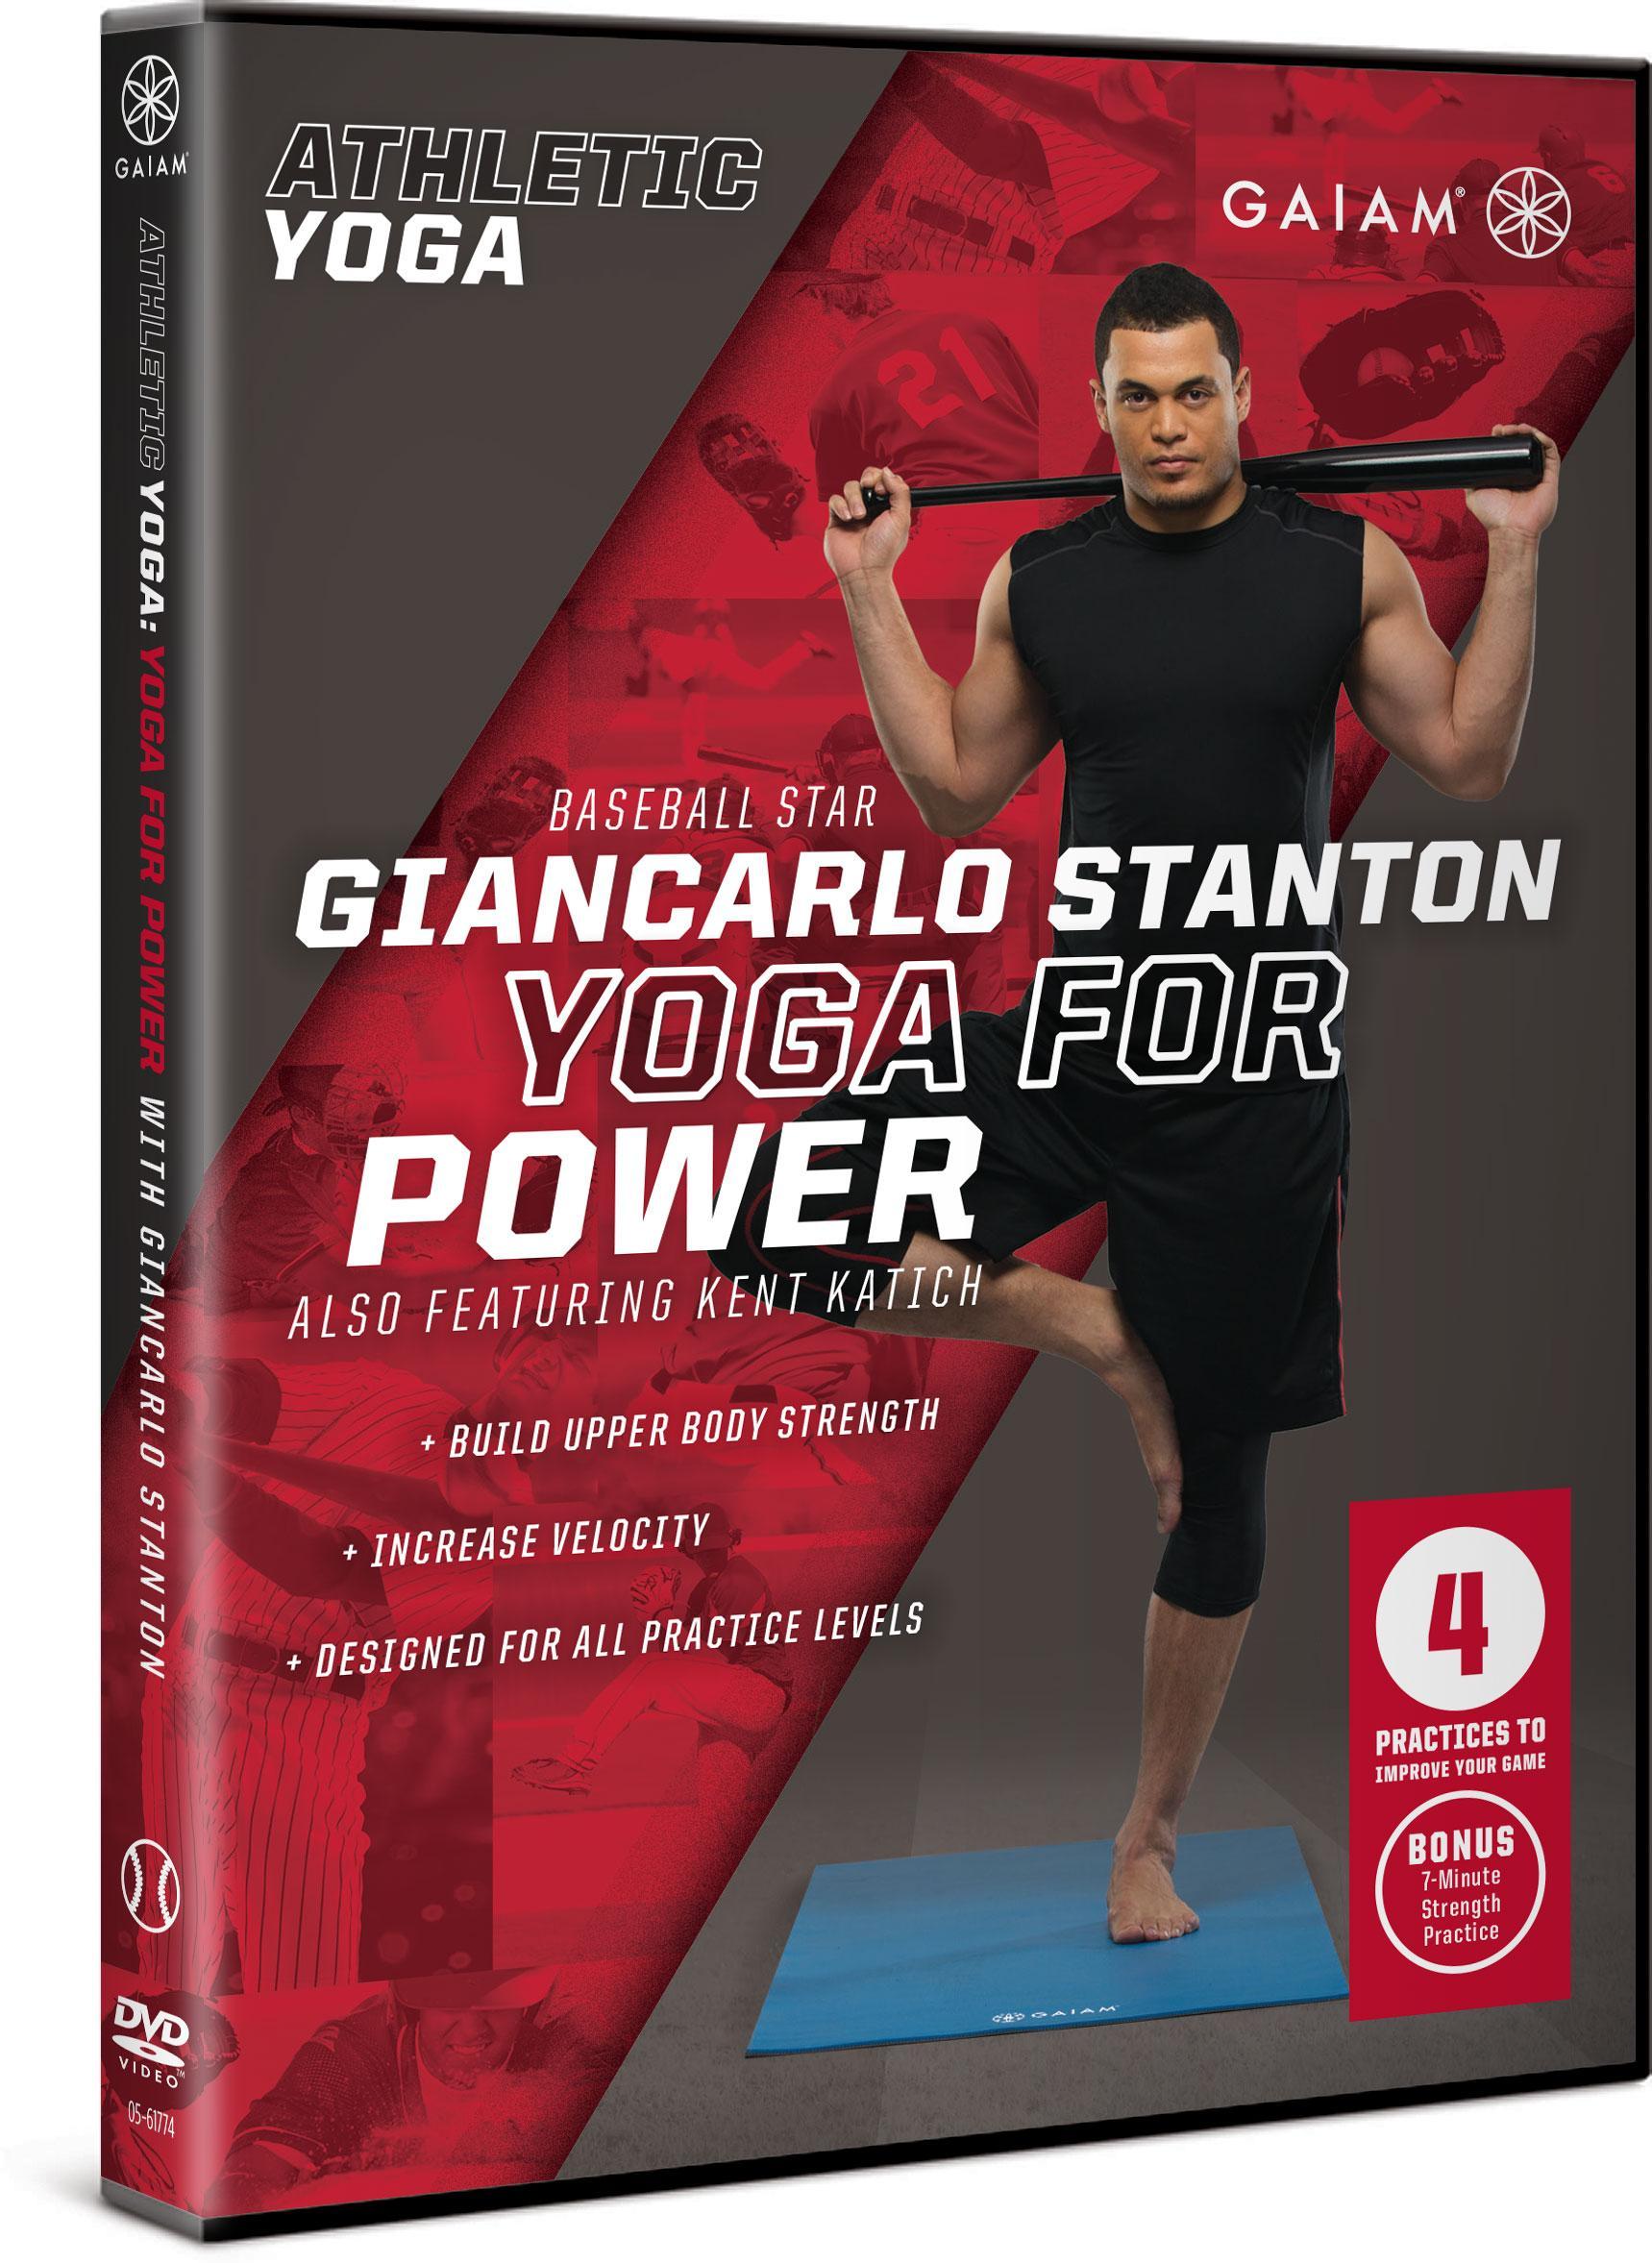 Amazon.com: Gaiam Athletic Yoga: Yoga for Power with